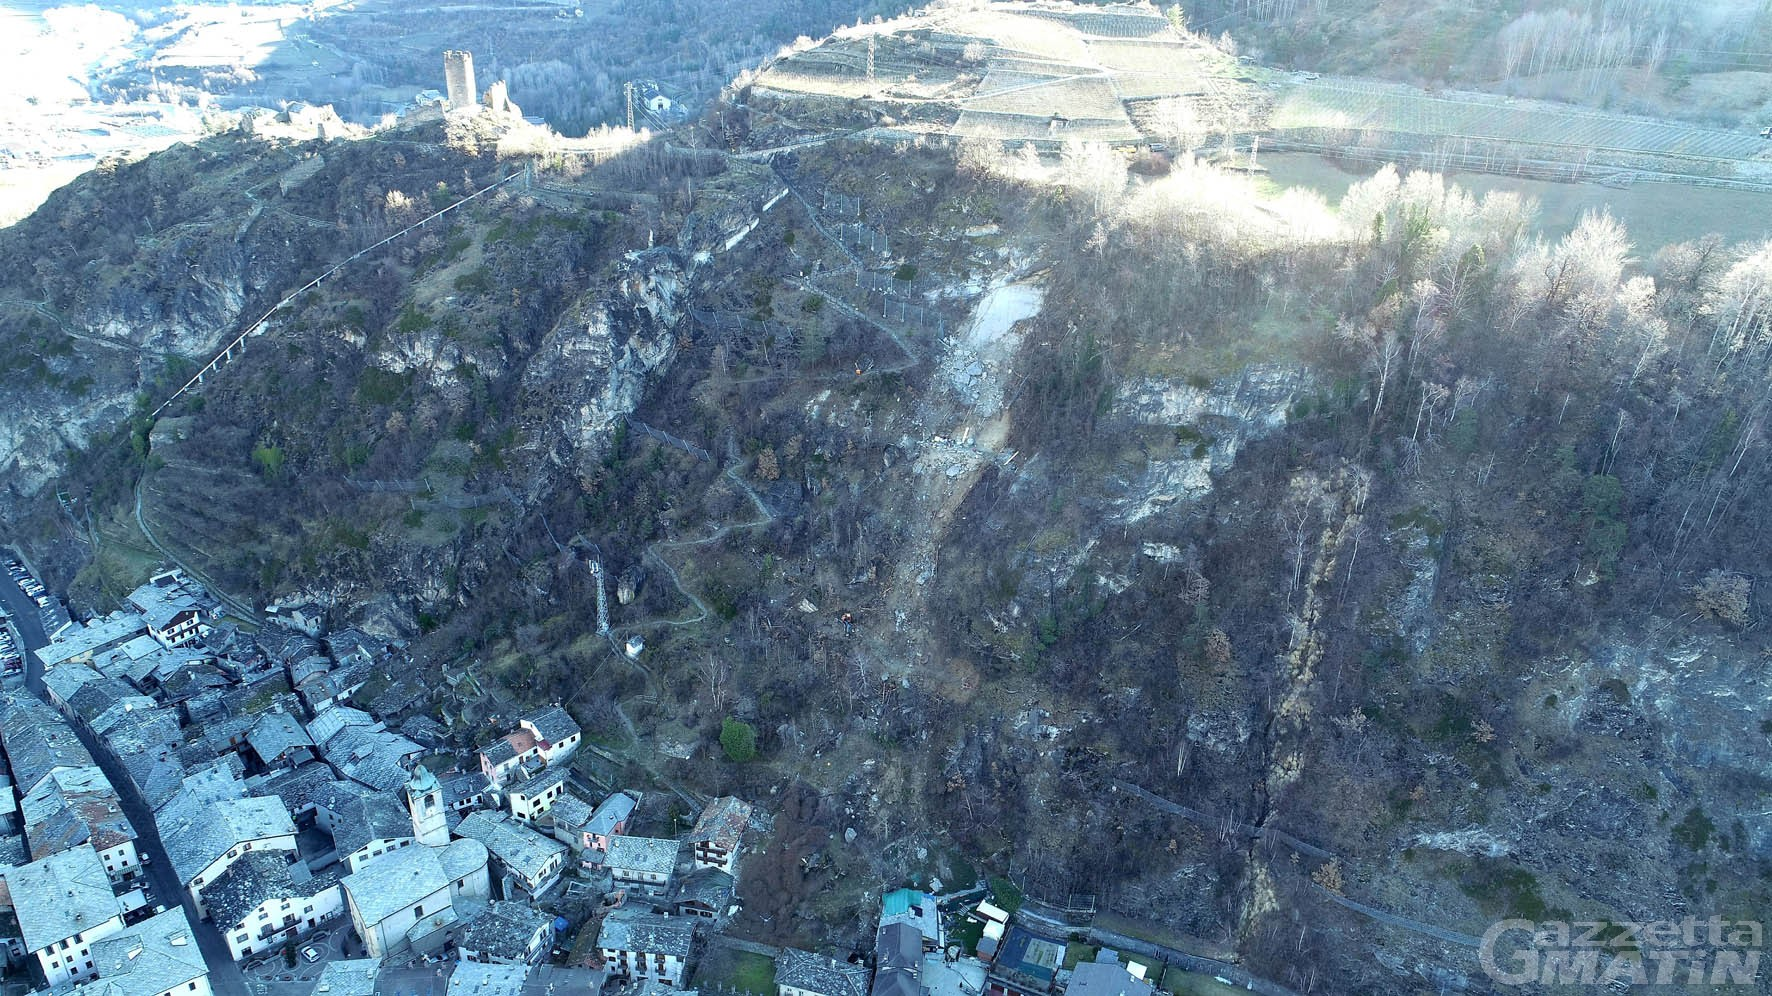 Frana di Villeneuve: la Regione sollecita l'iter per l'«eccezionale calamità»